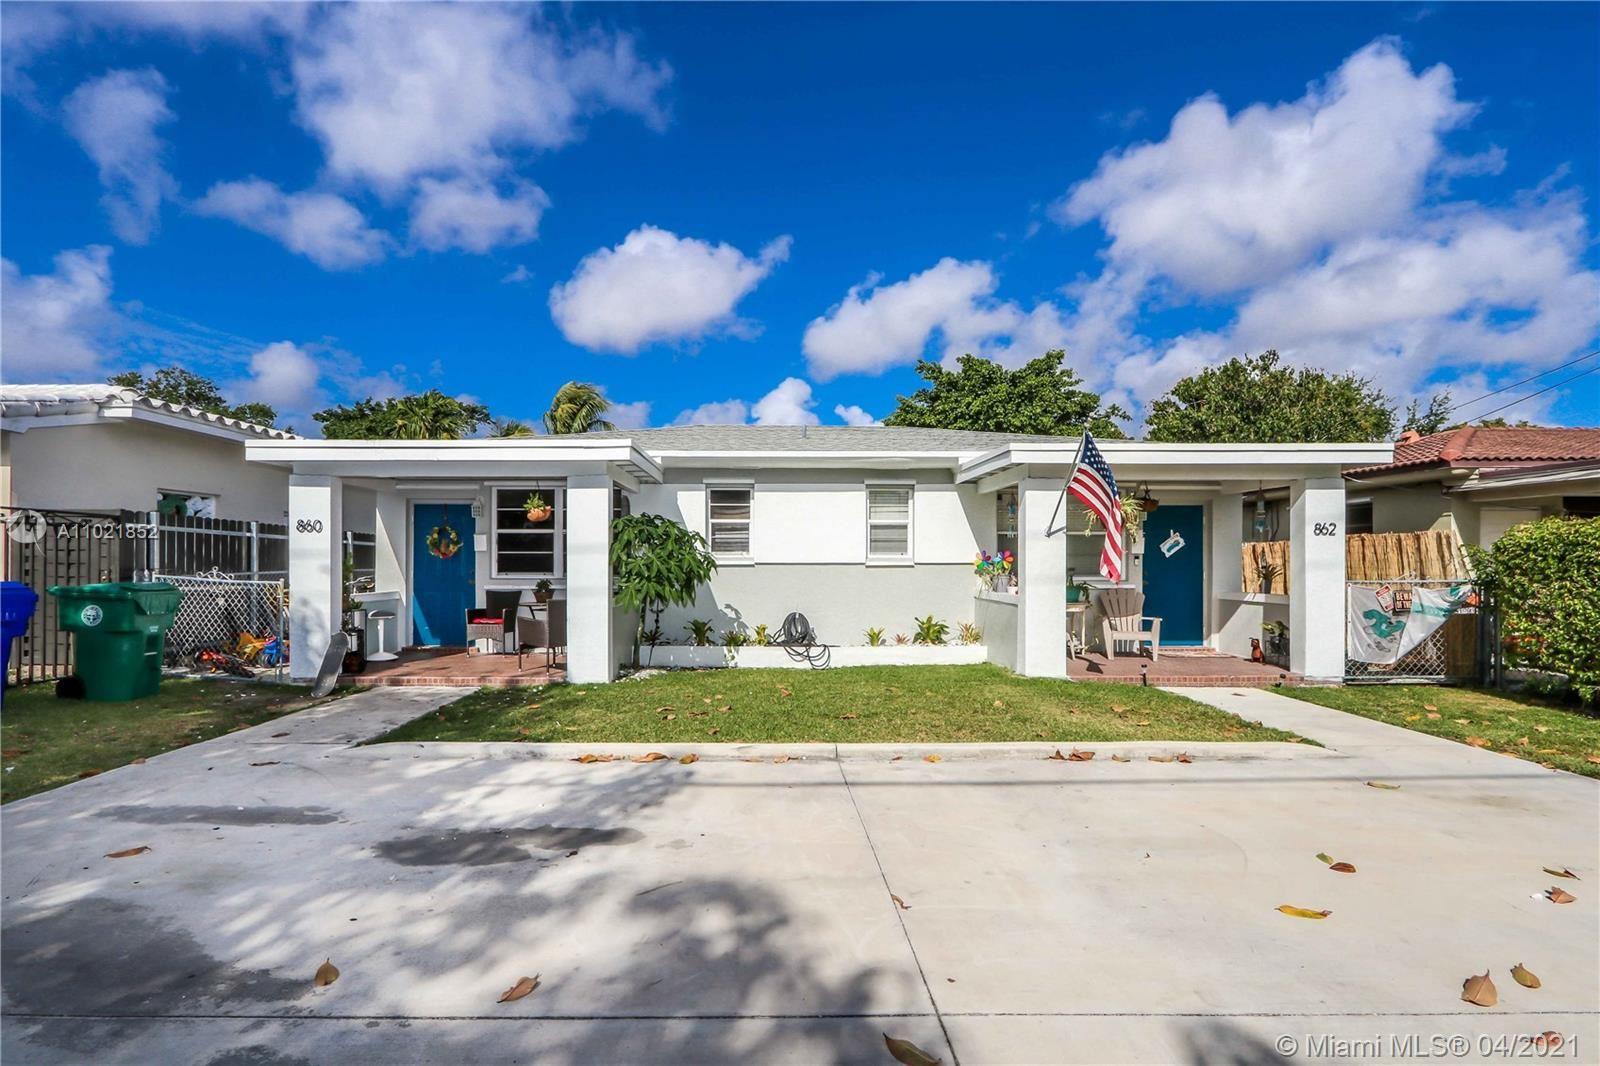 860 NW 31st Ave, Miami, FL 33125 - #: A11021852